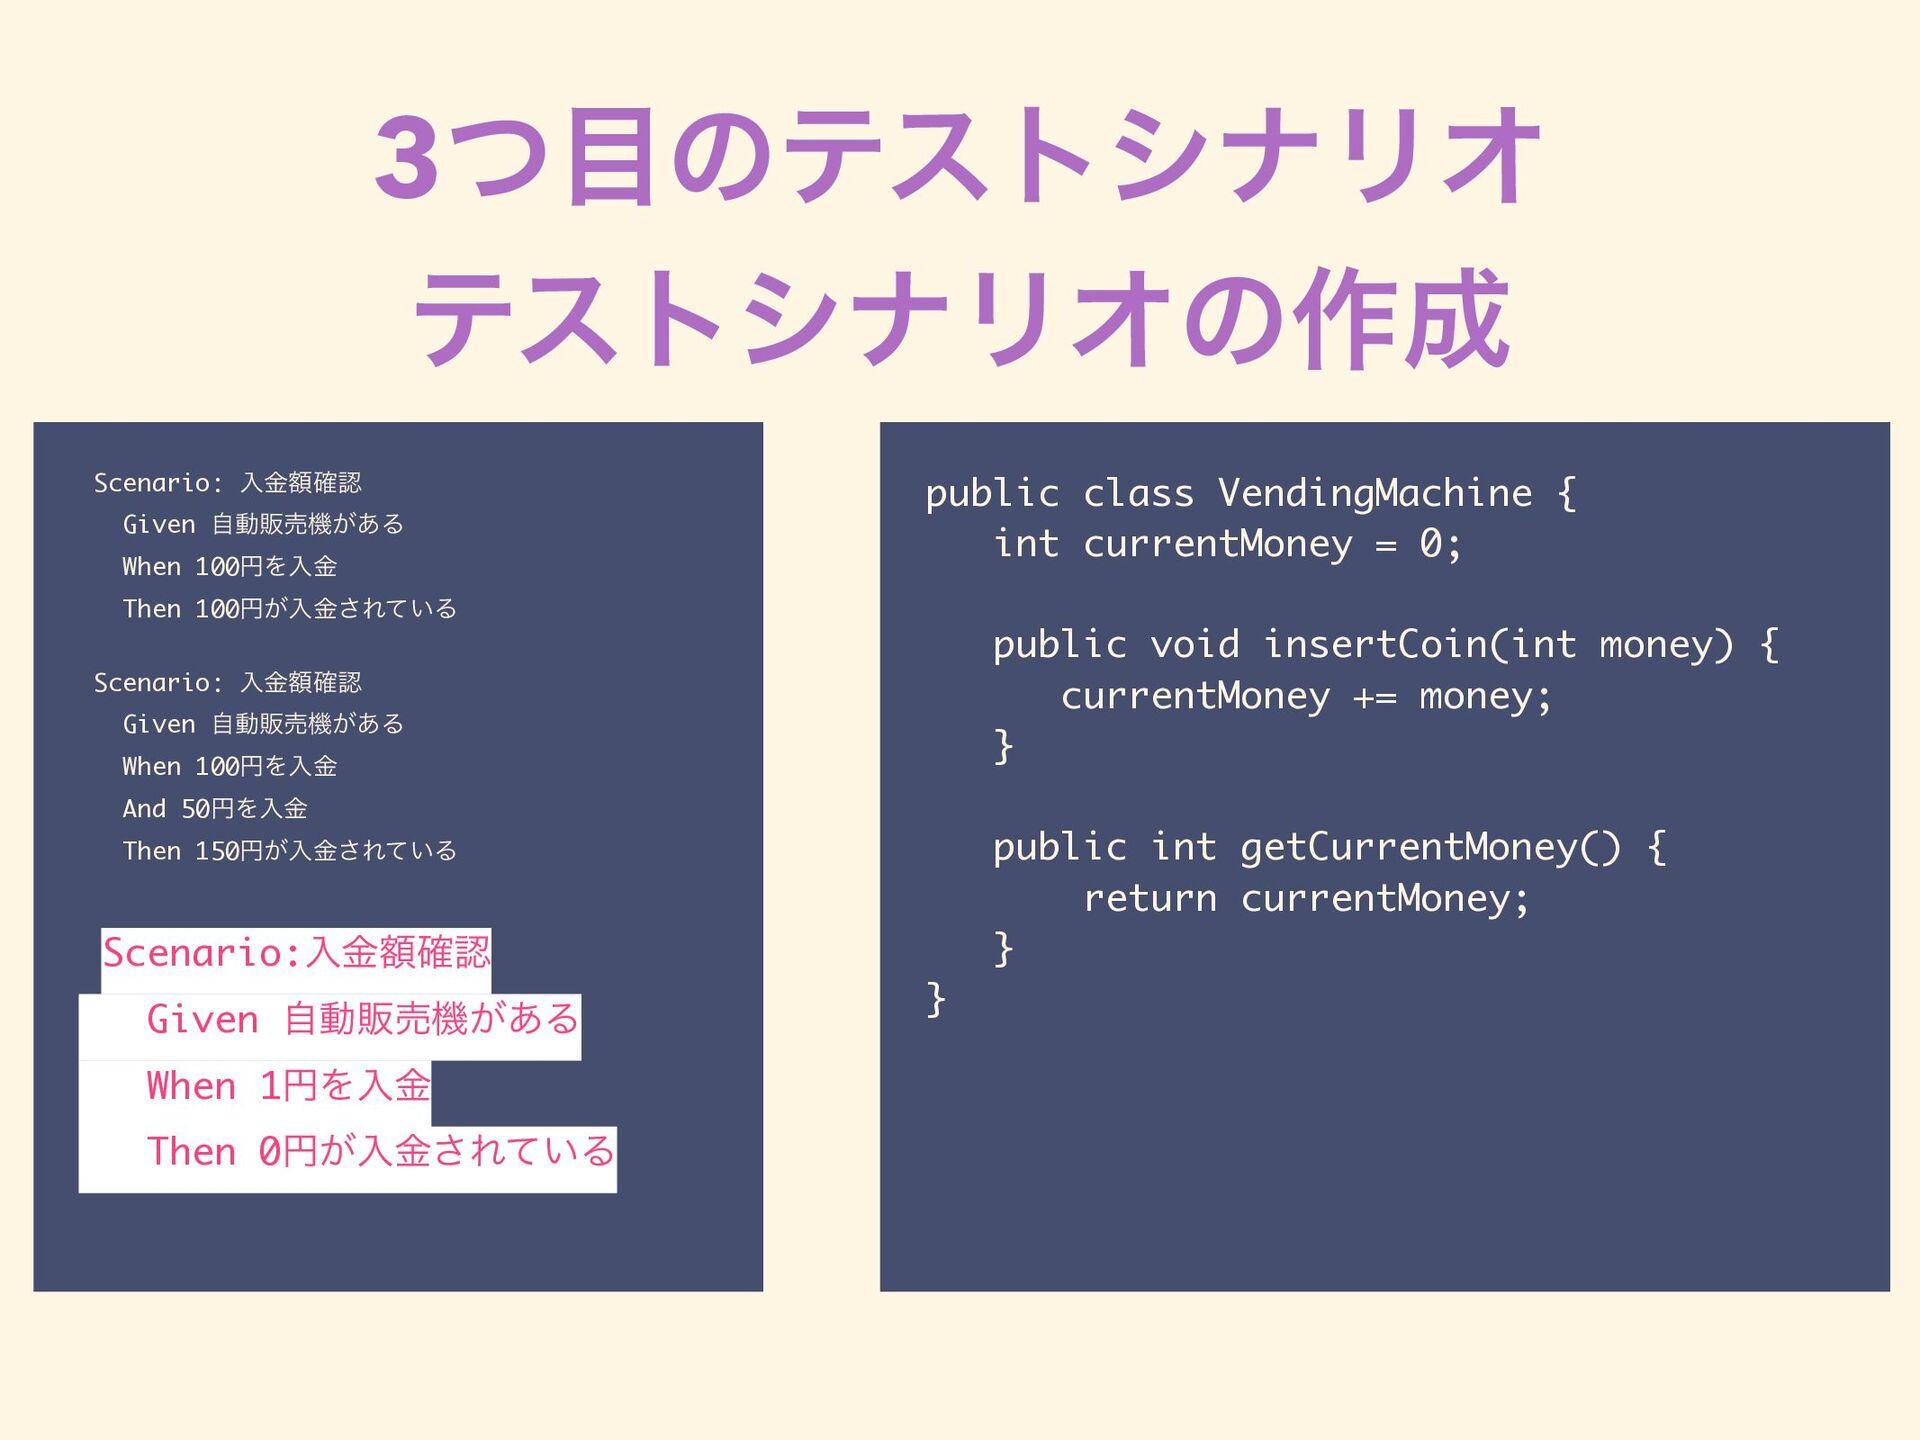 3ͭͷςετγφϦΦ ςετγφϦΦͷ࡞ Scenario: ೖֹۚ֬ Given ࣗಈ...